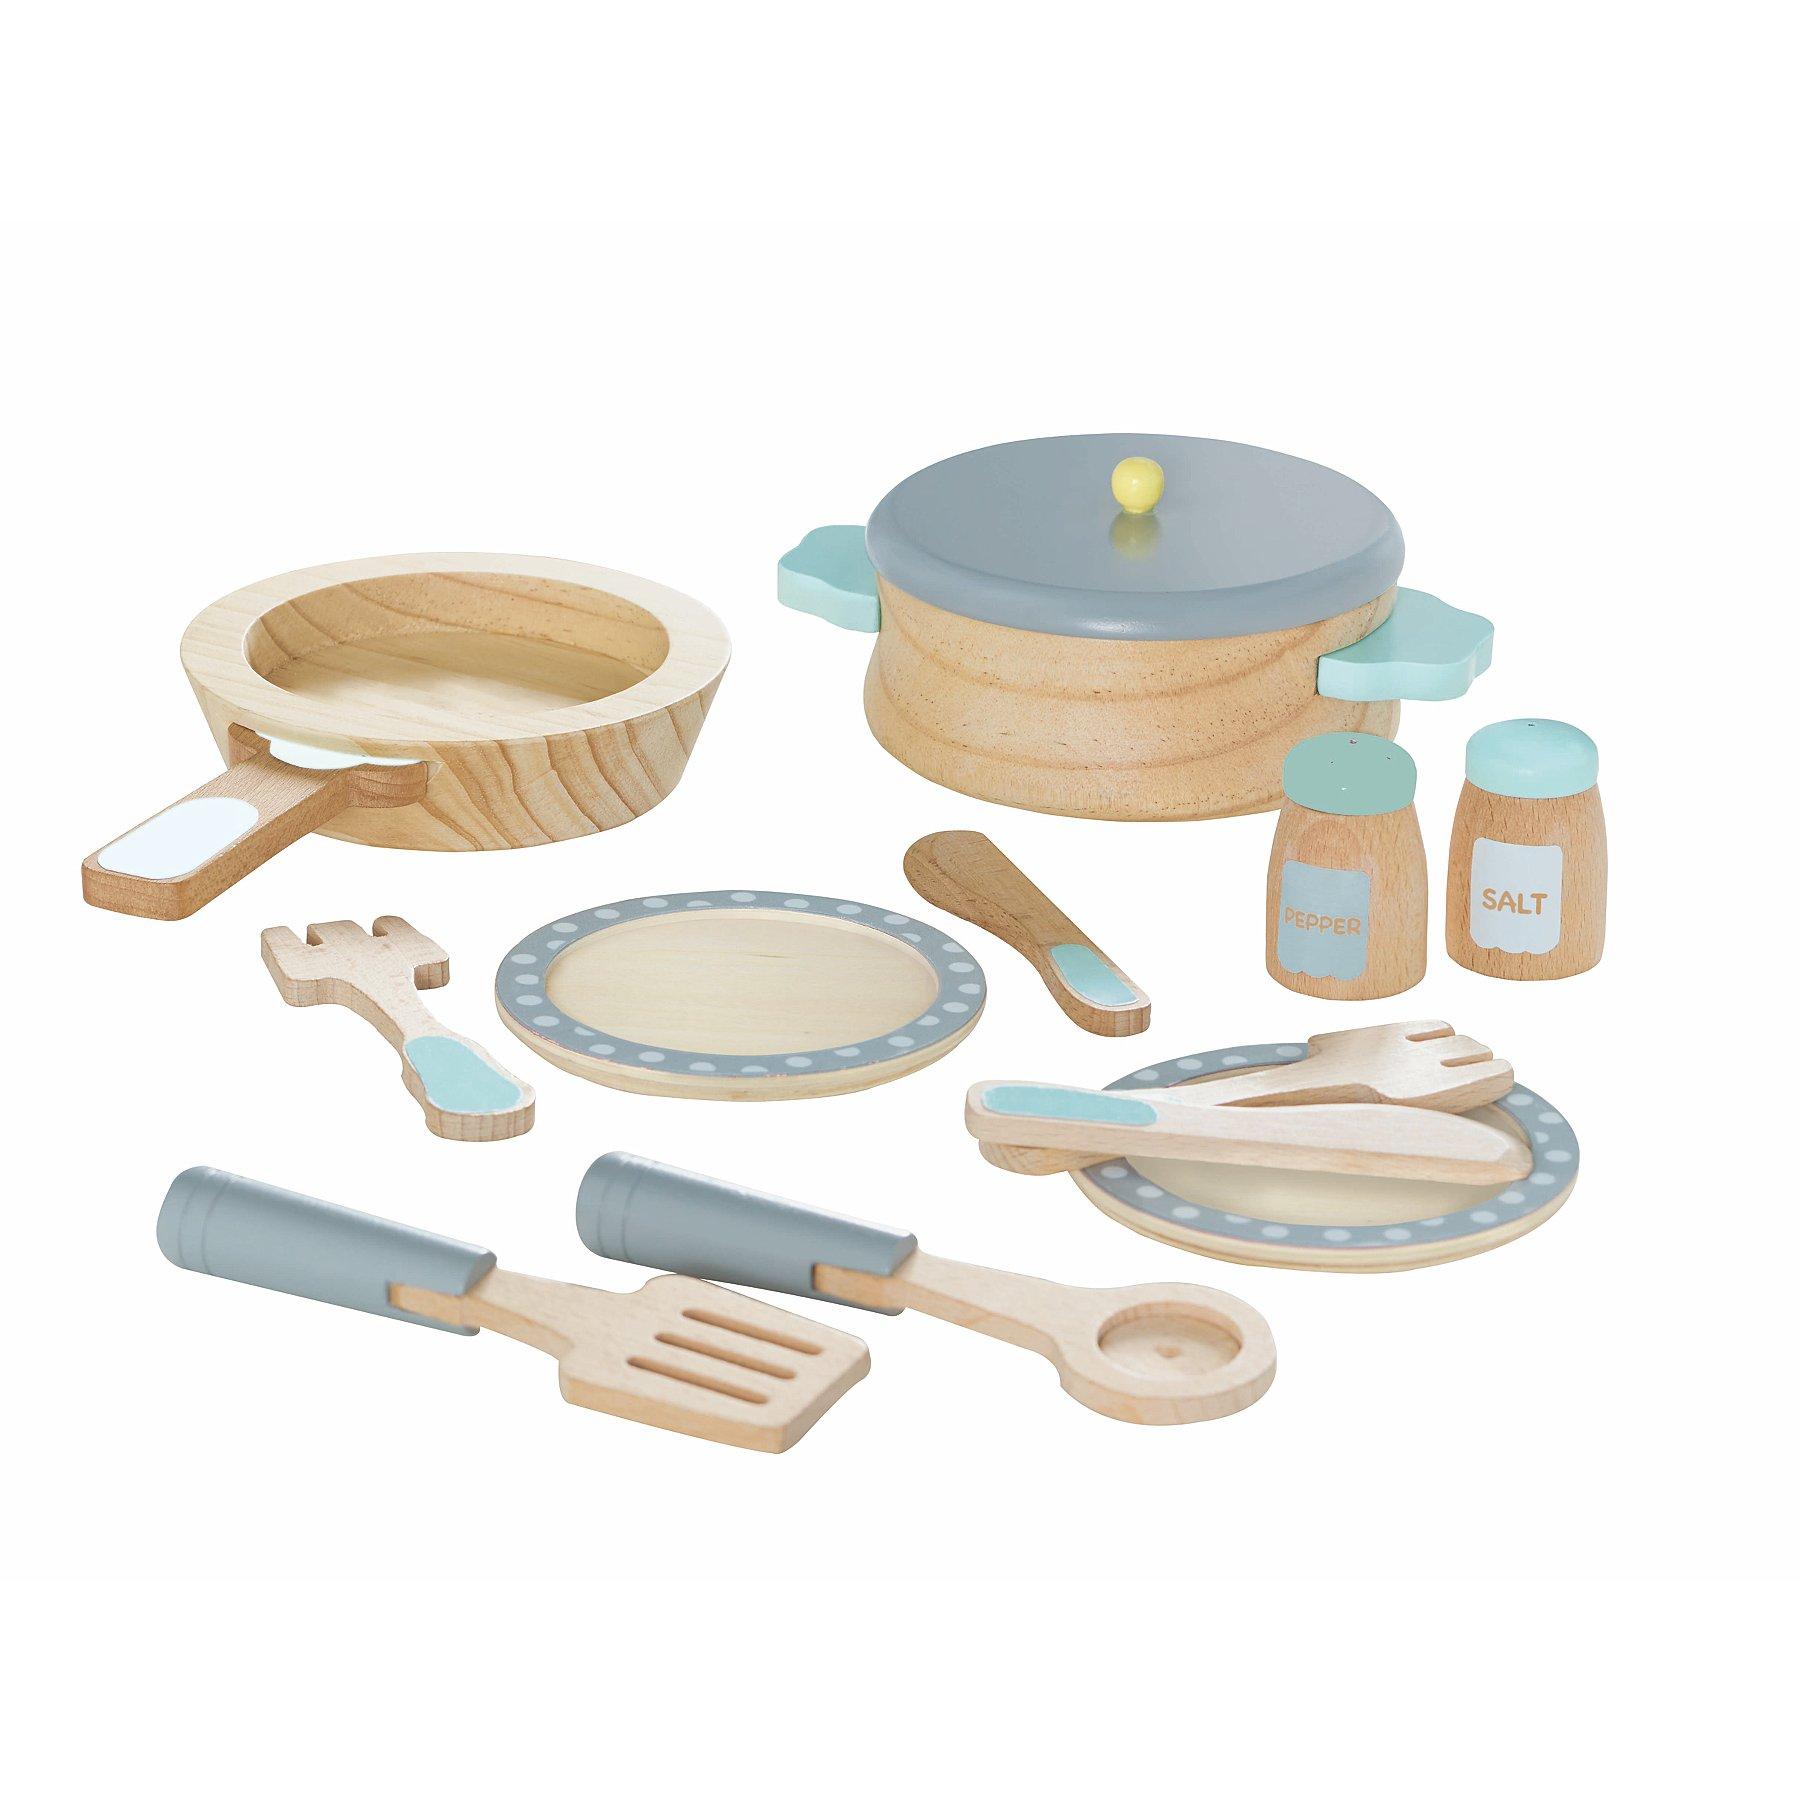 Wooden Cooking Set